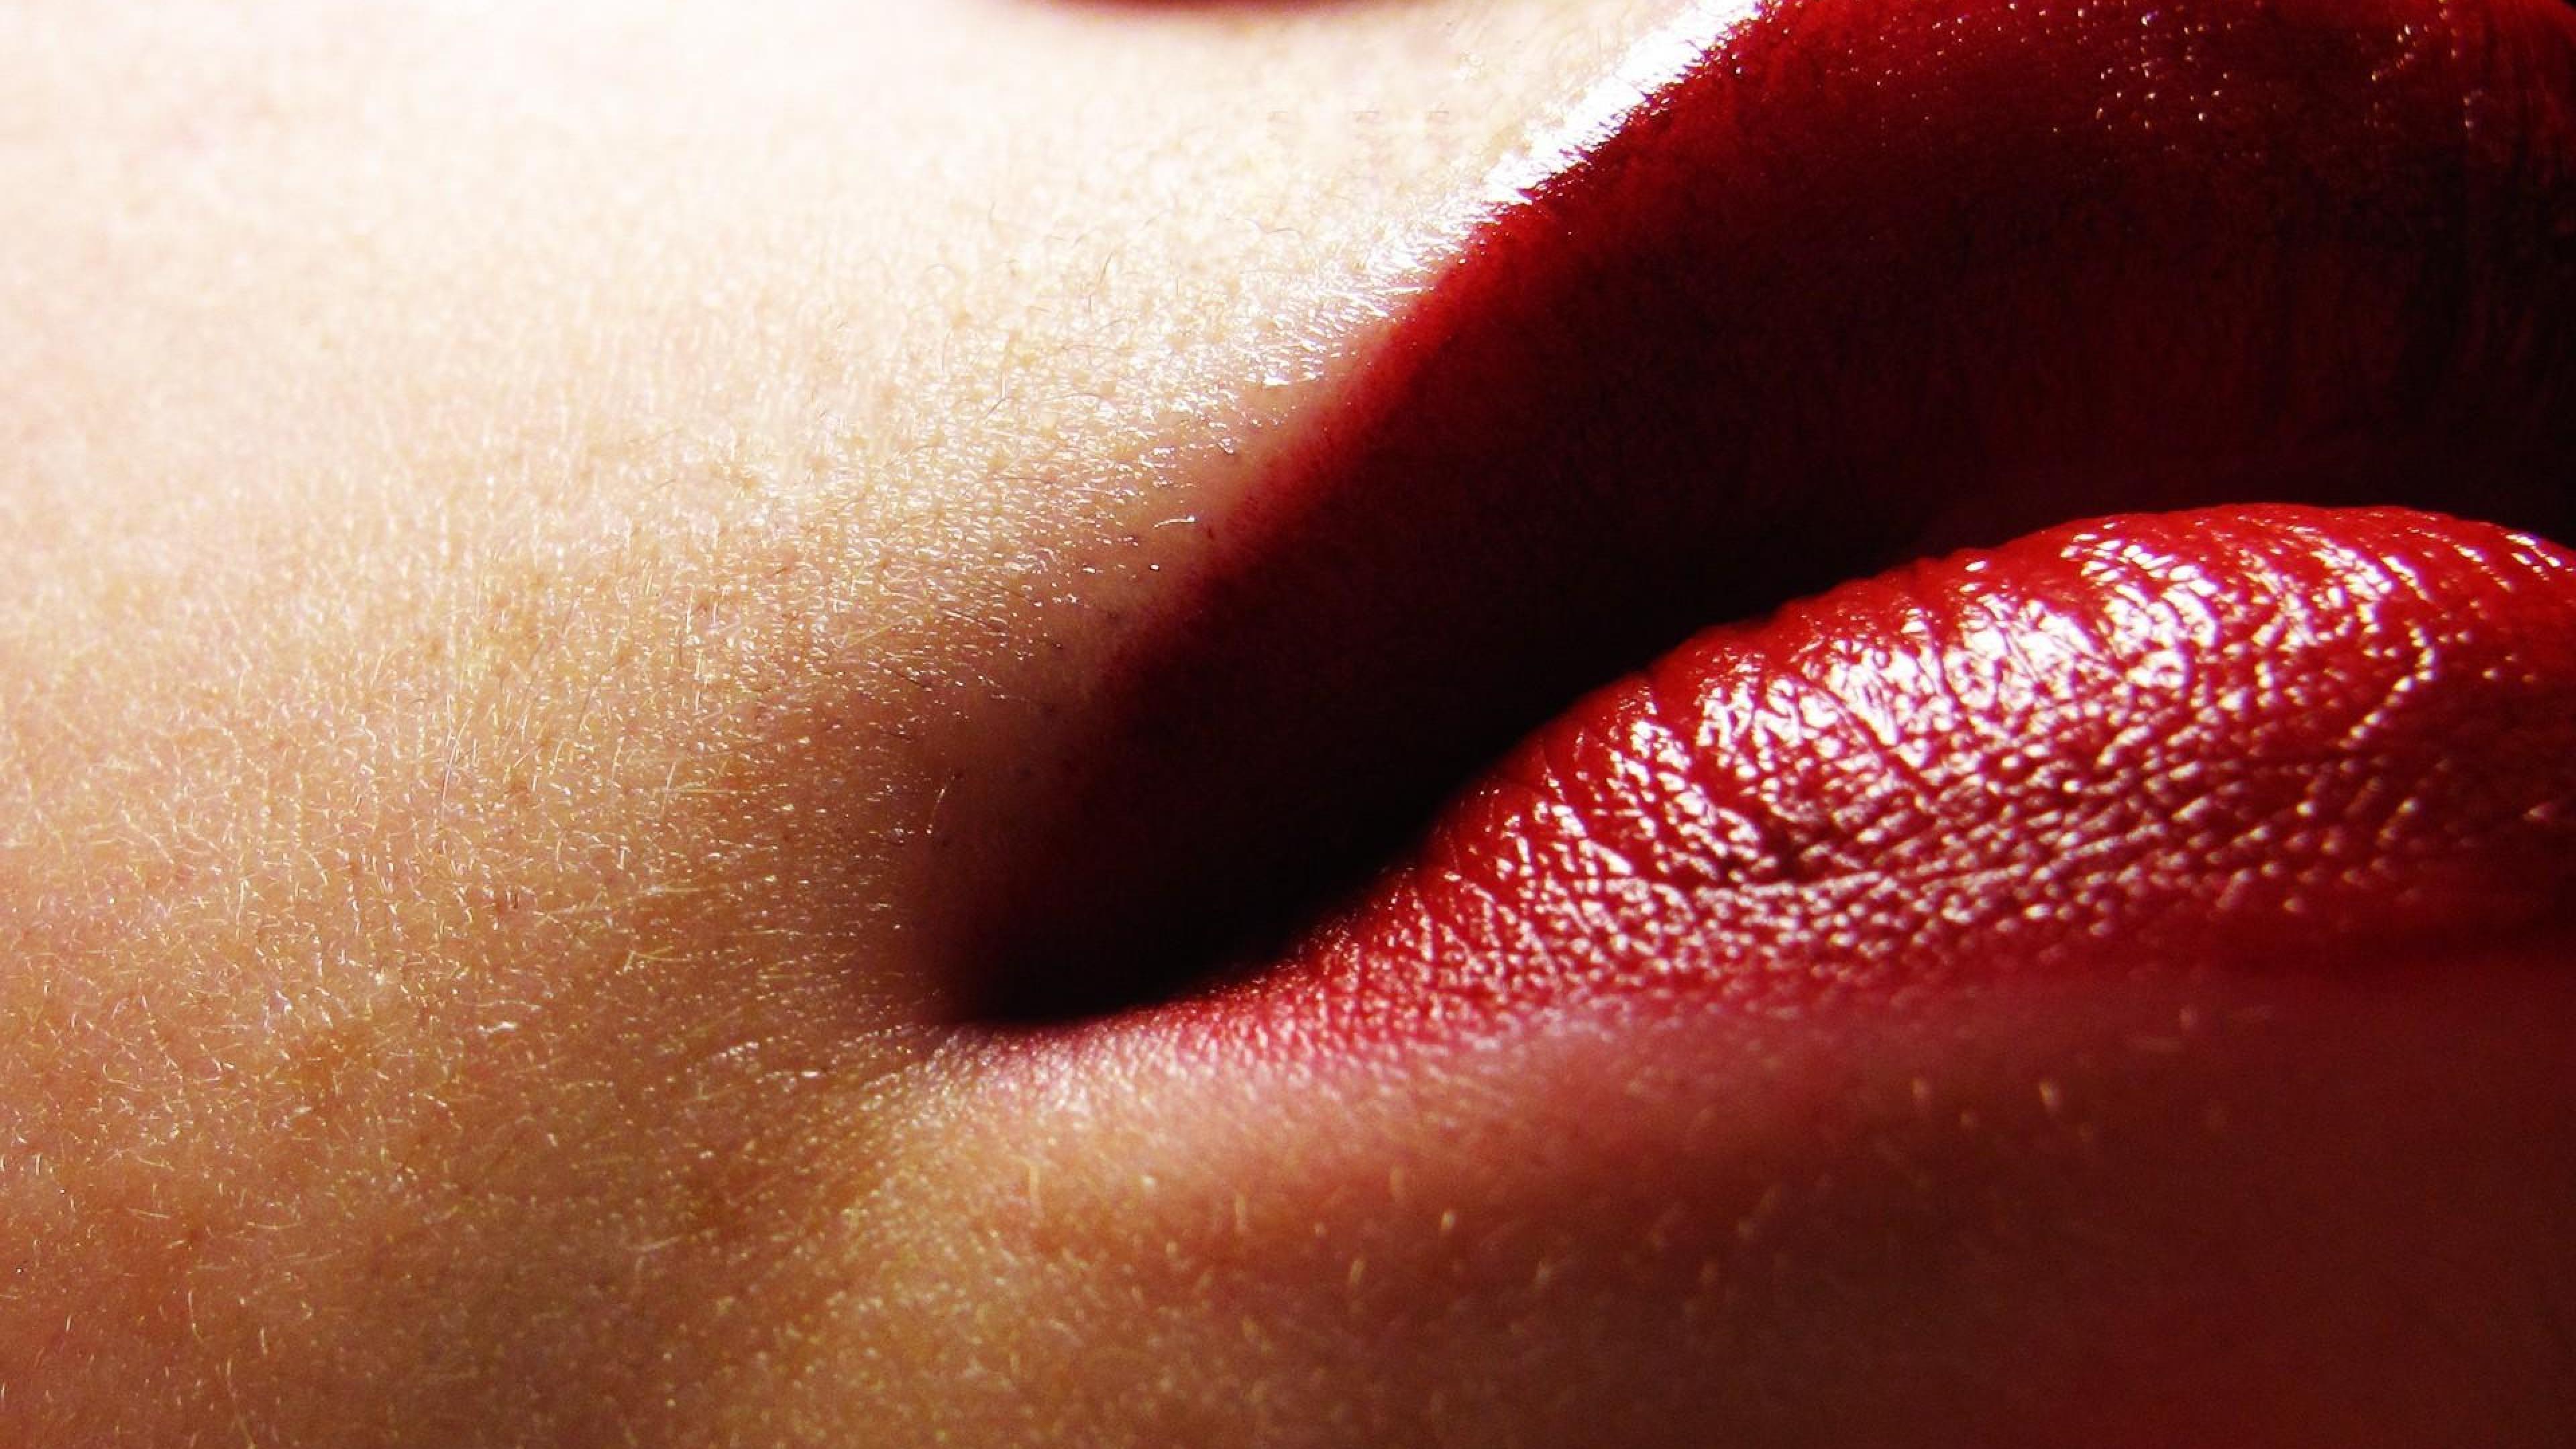 Fall Hipster Wallpapers Hd Red Lips Wallpapers Pixelstalk Net